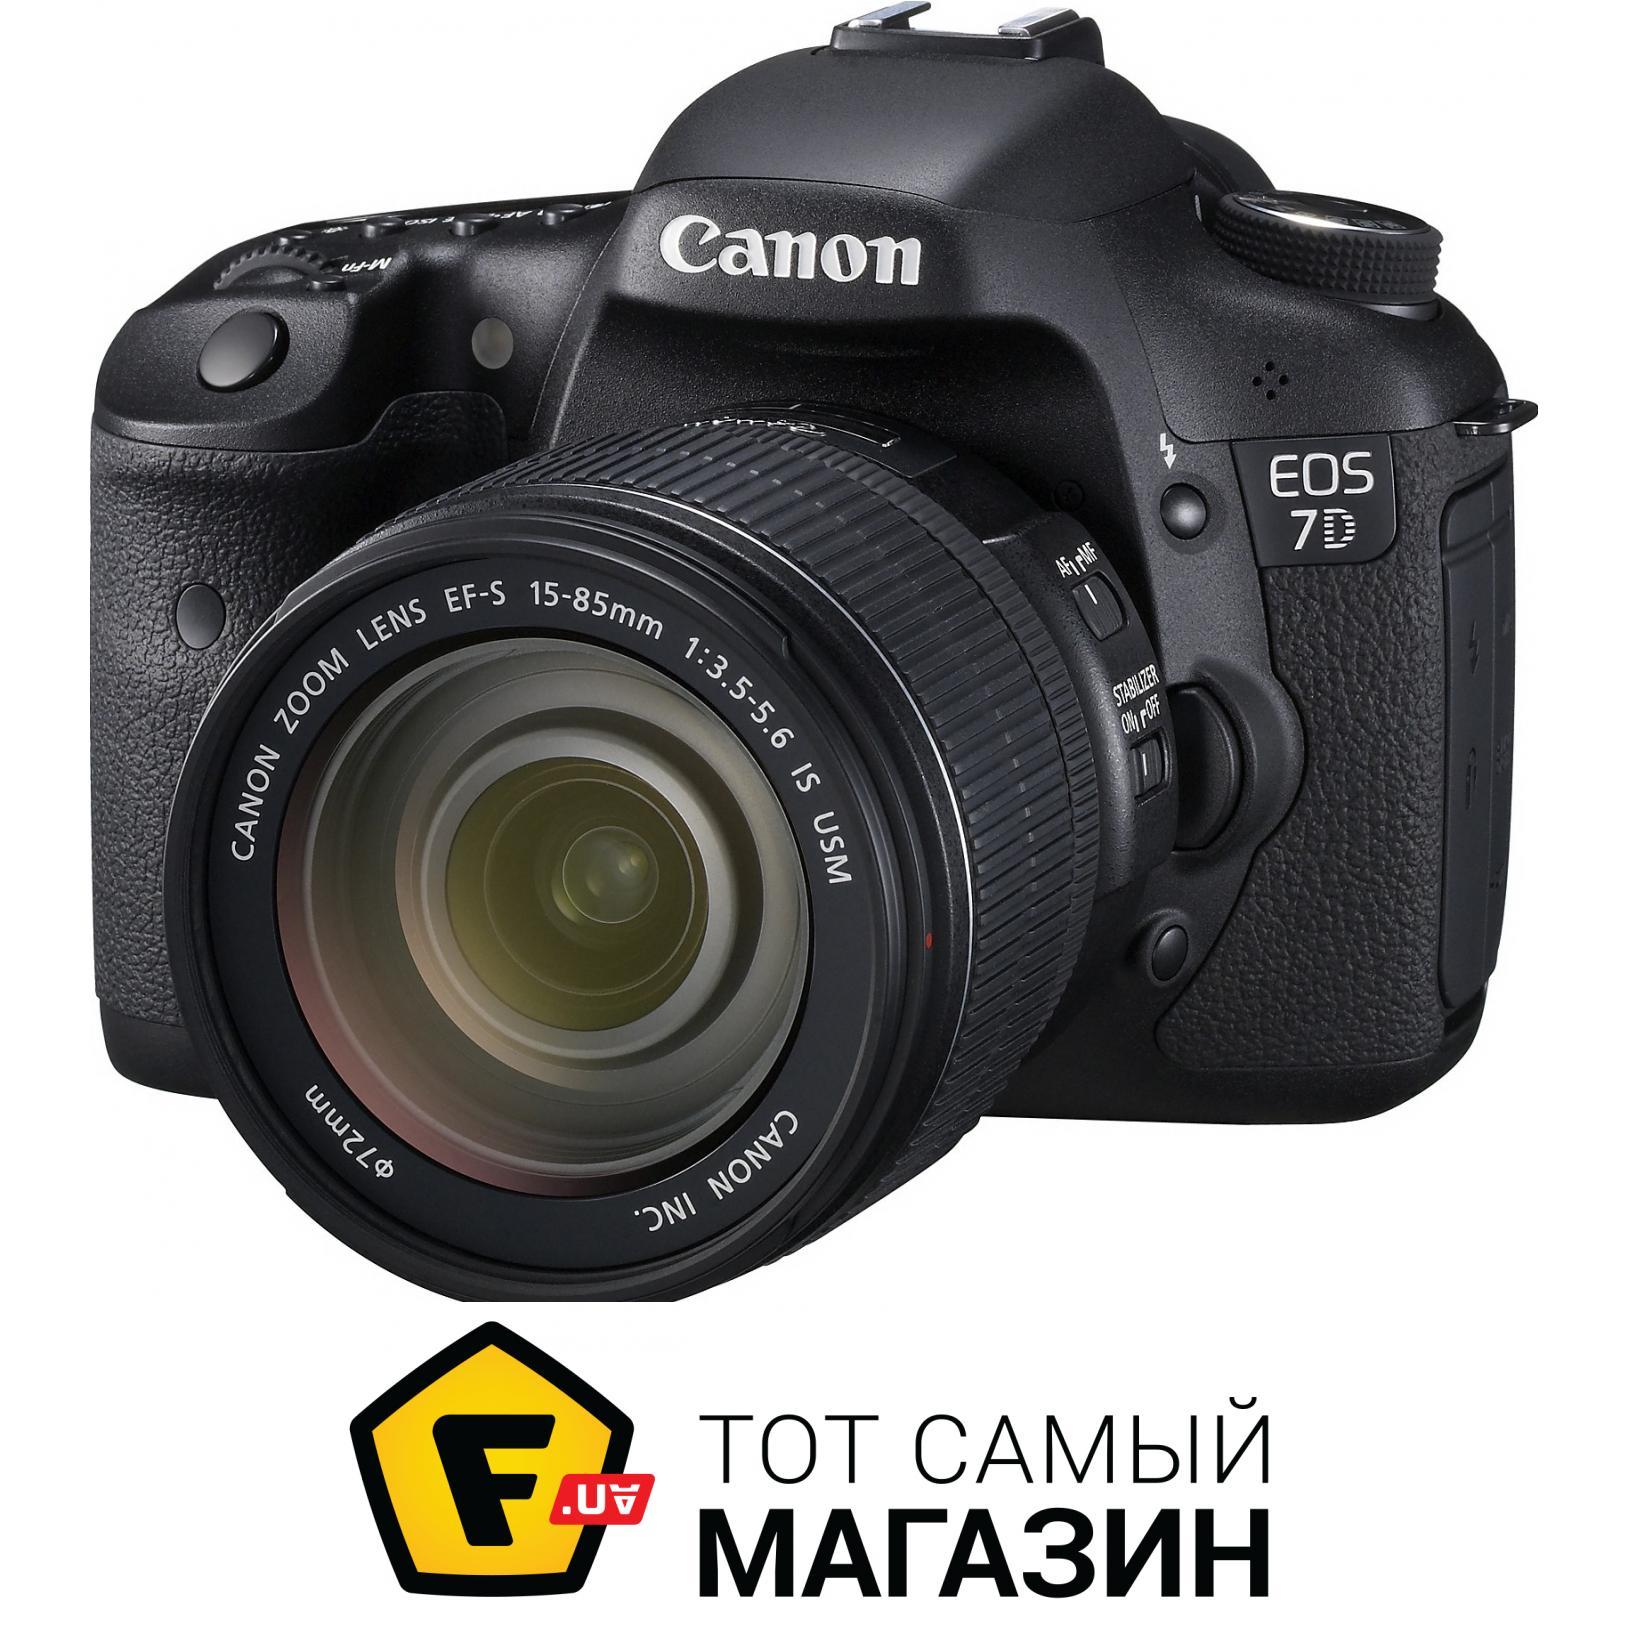 Фотоаппарат Nikon 1 J5 Kit 10-30 mm F/3.5-5.6 VR PD-Zoom White-Silver